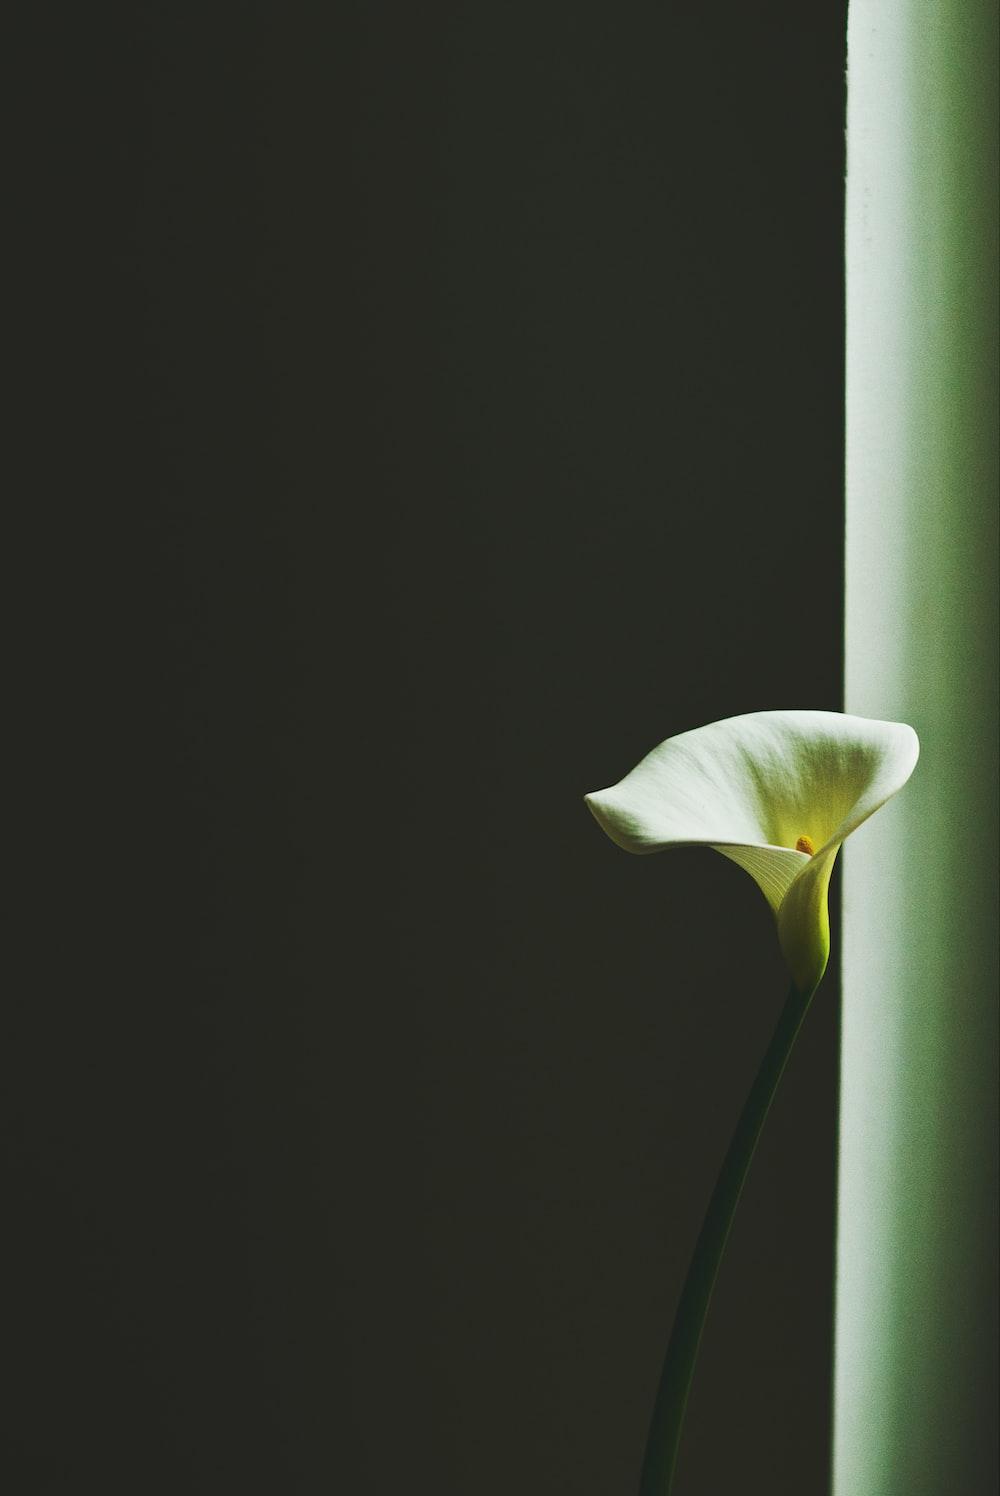 Graceful Bell Shaped Flower Photo By Marta Pawlik Martapawlik On